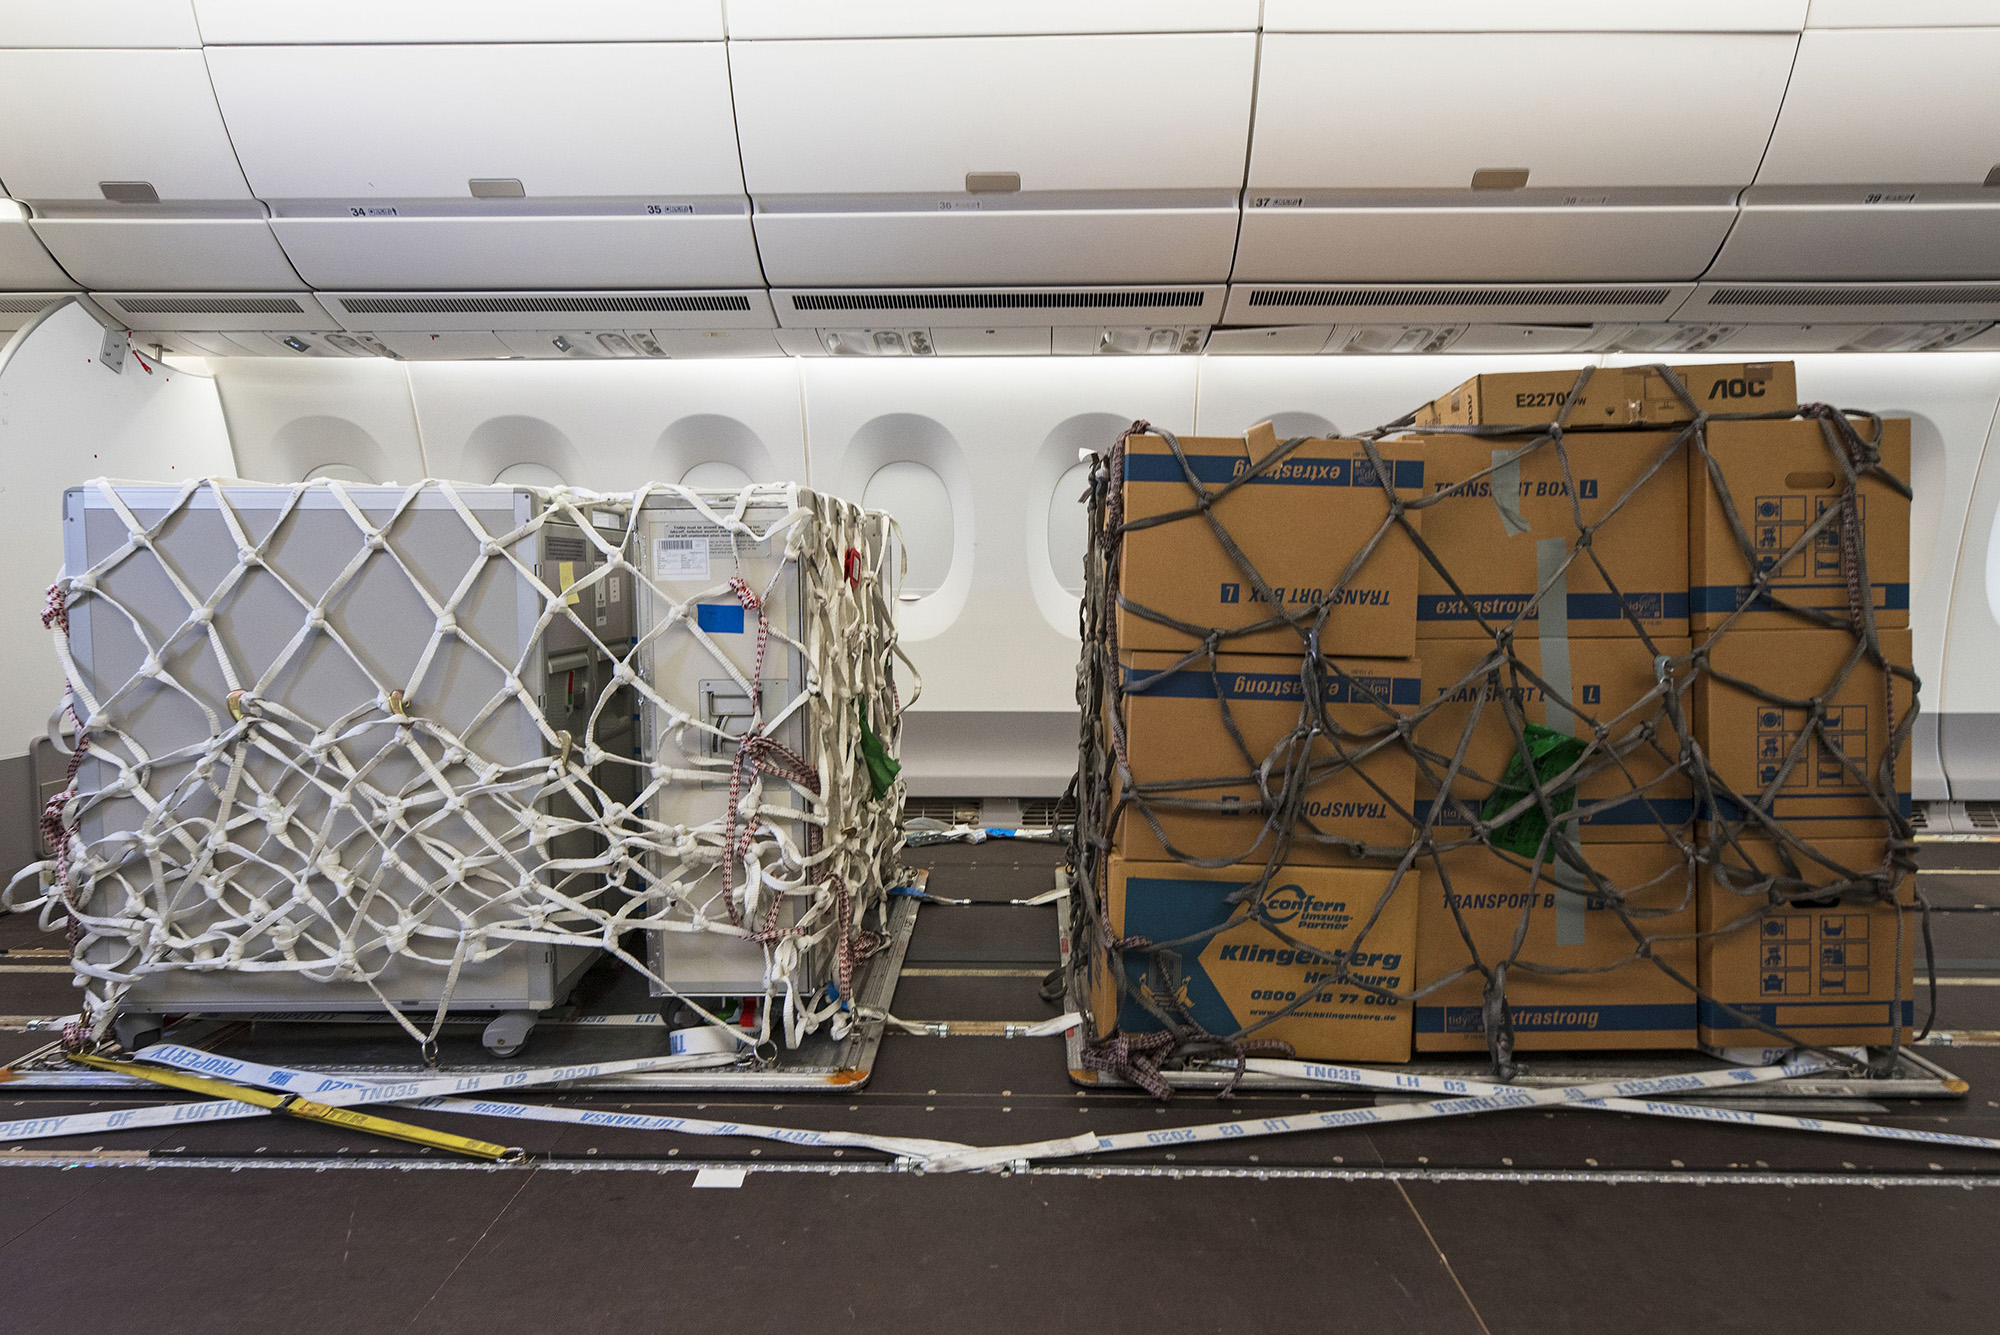 Cabin Cargo Flexibility (Airbus)